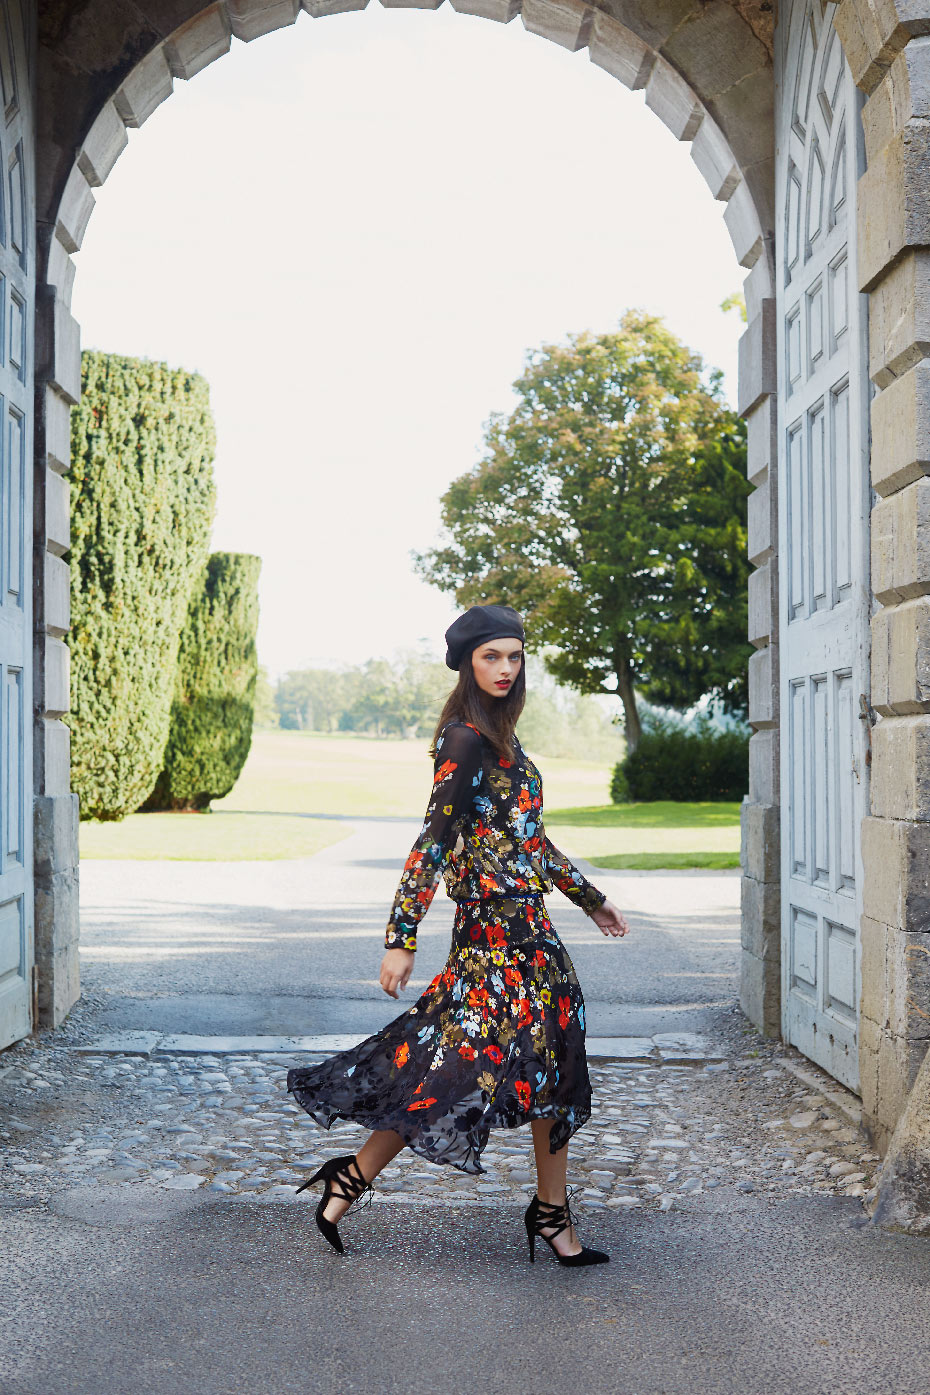 Stacey Van Berkel Photography I Carton House Travel Fashion Shoot I Elegant & French inspired style I Kildare, Ireland